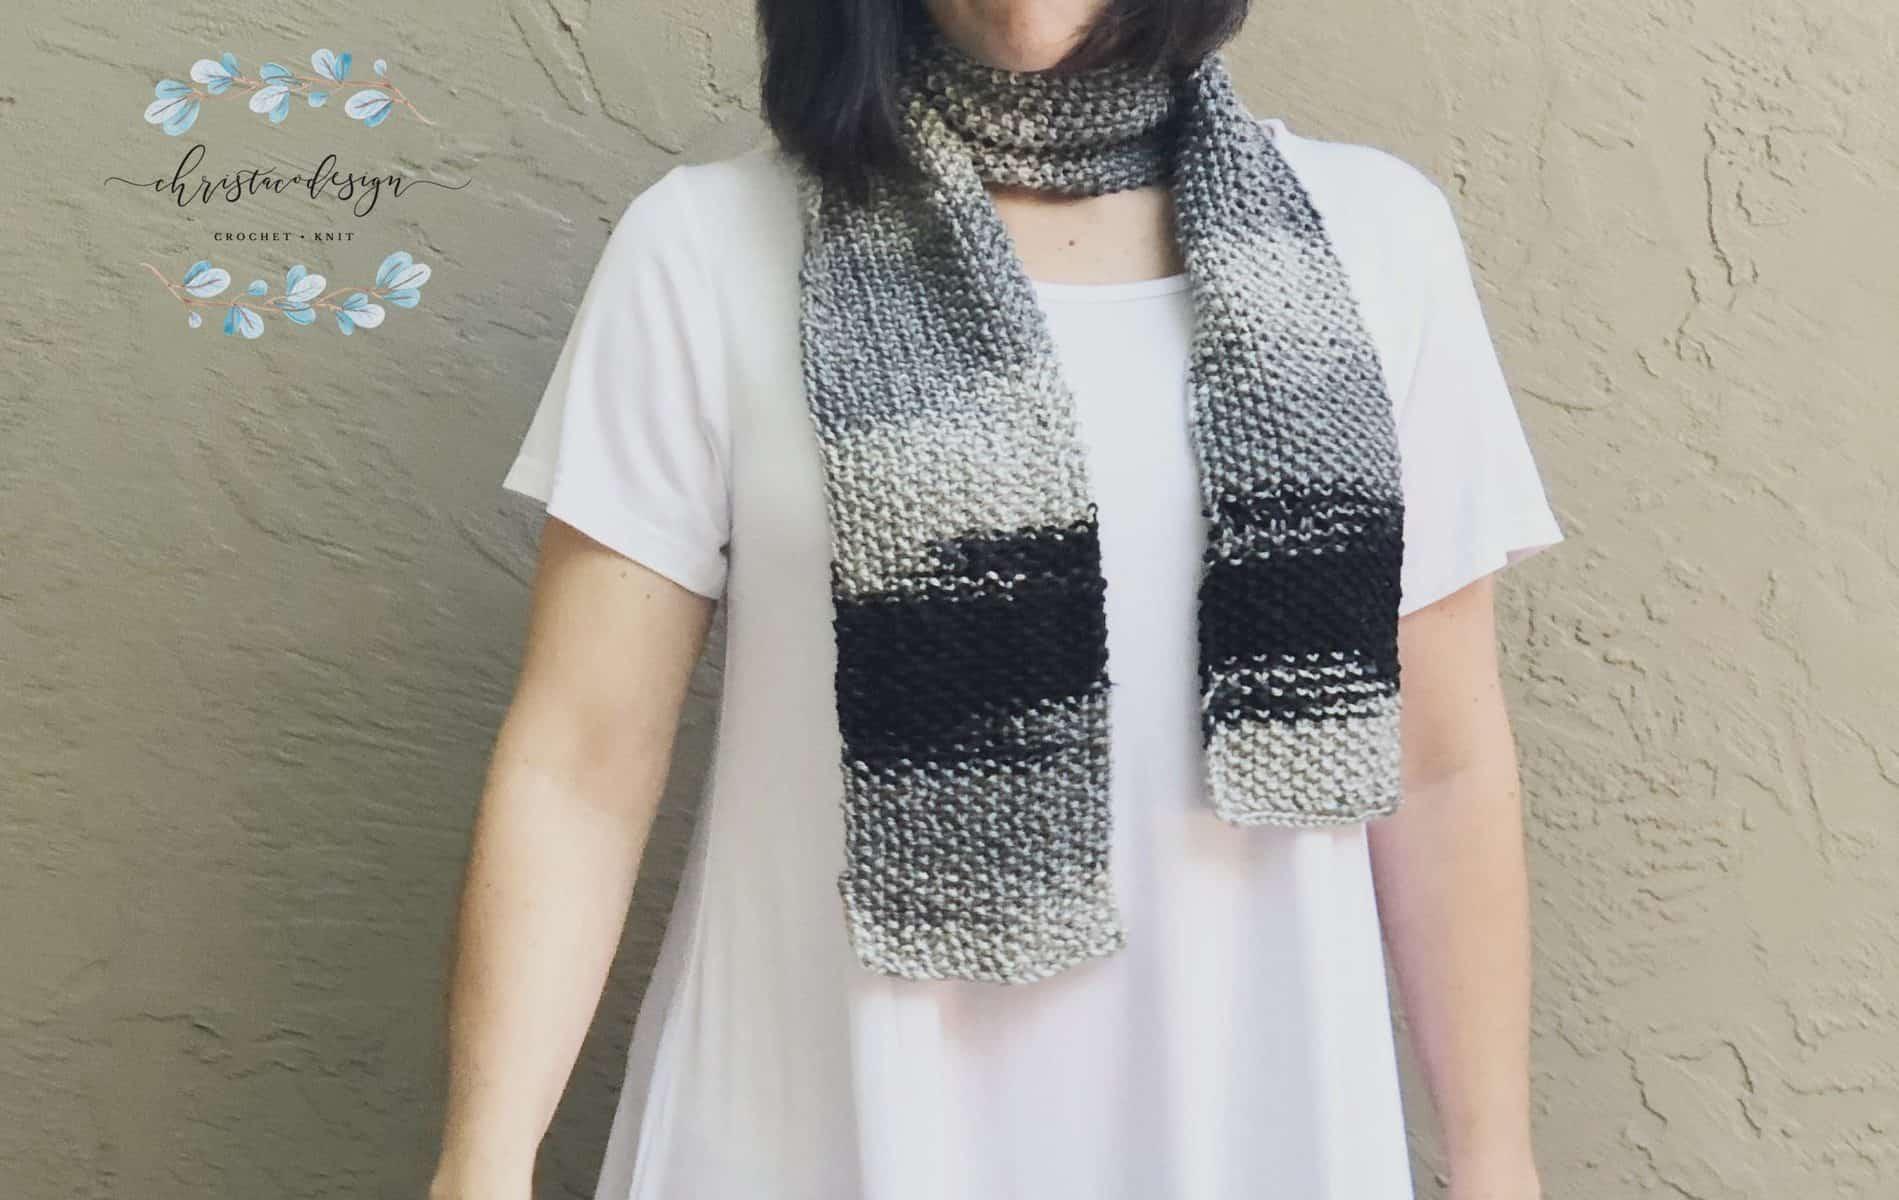 Seed Stitch Textured Knit Scarf a Free Knitting Pattern